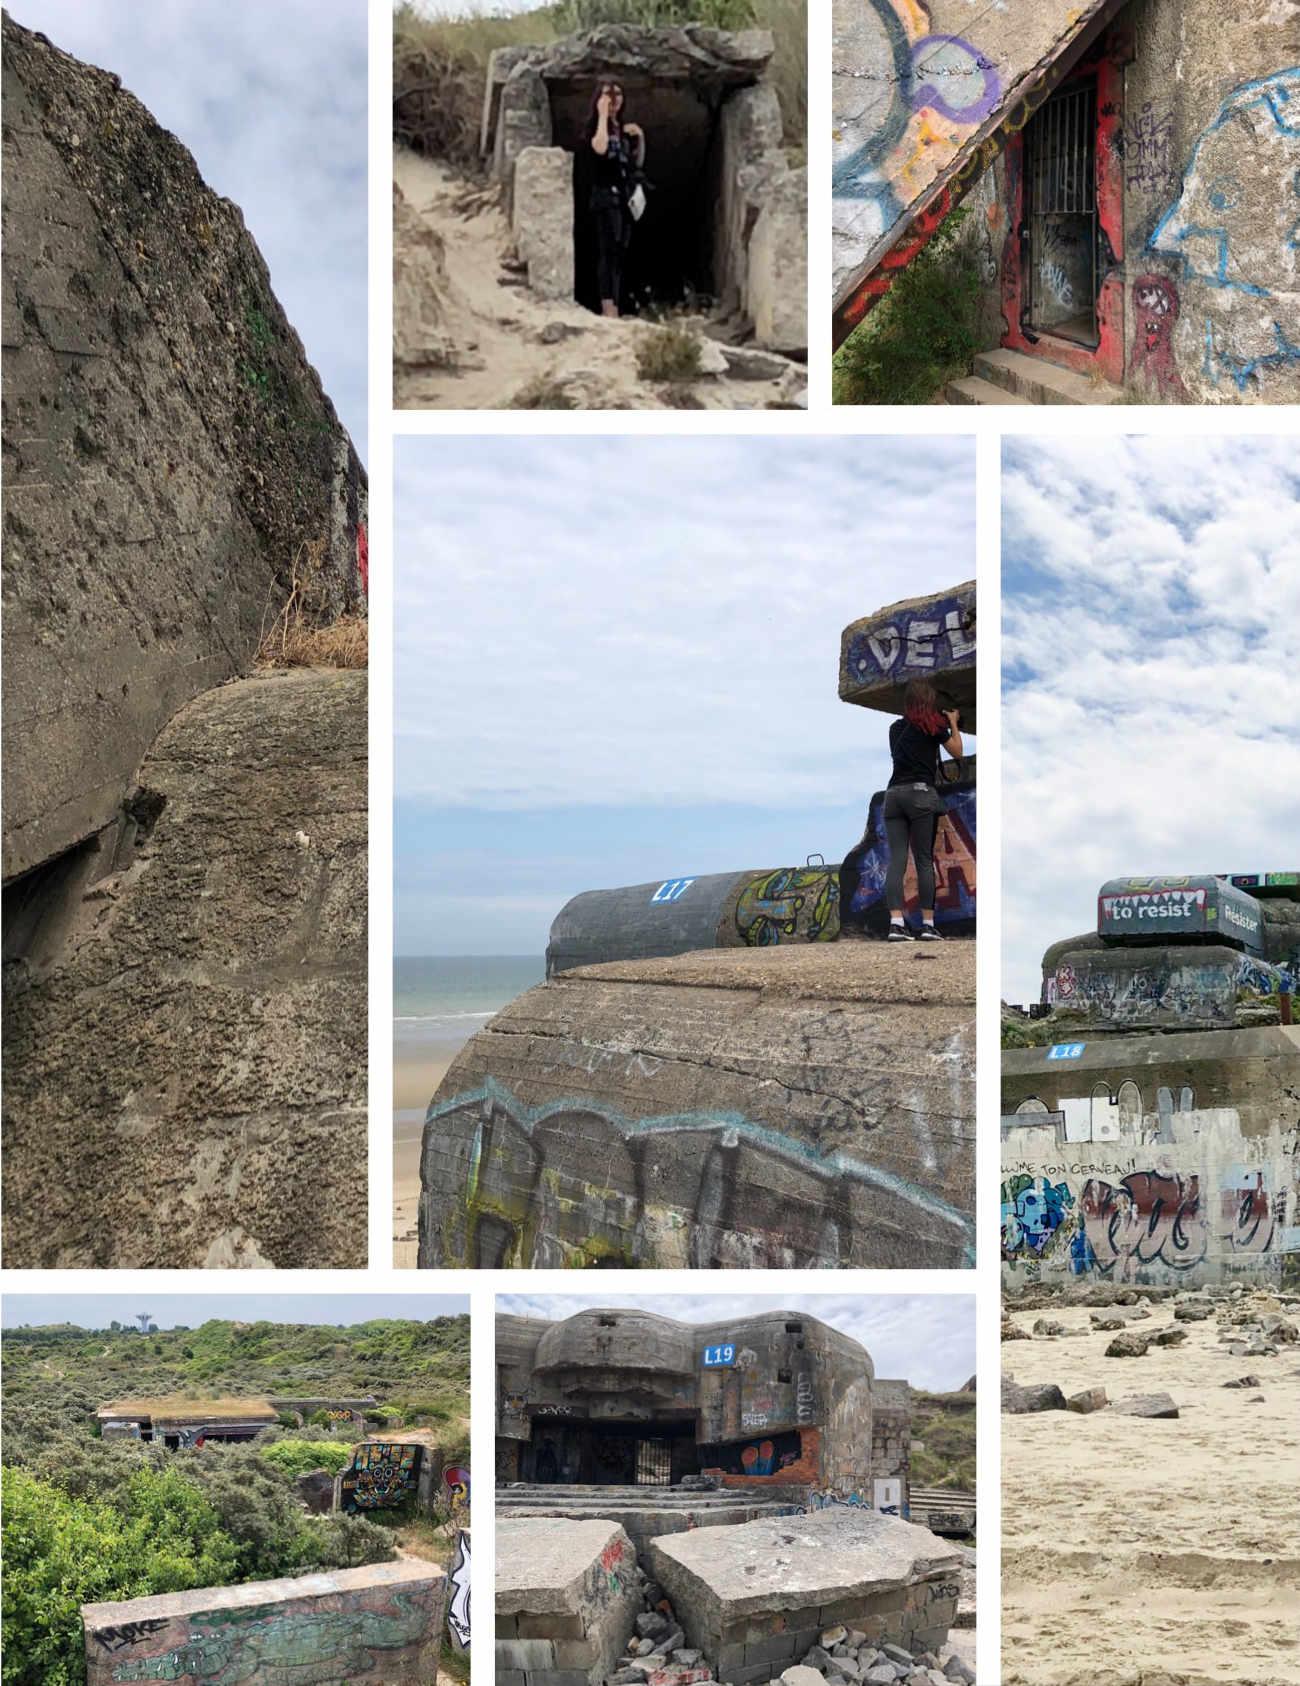 Dunkerque, Dunkirk, Dünkirchen, Urlaubsreise, Erkundung, Frankreich